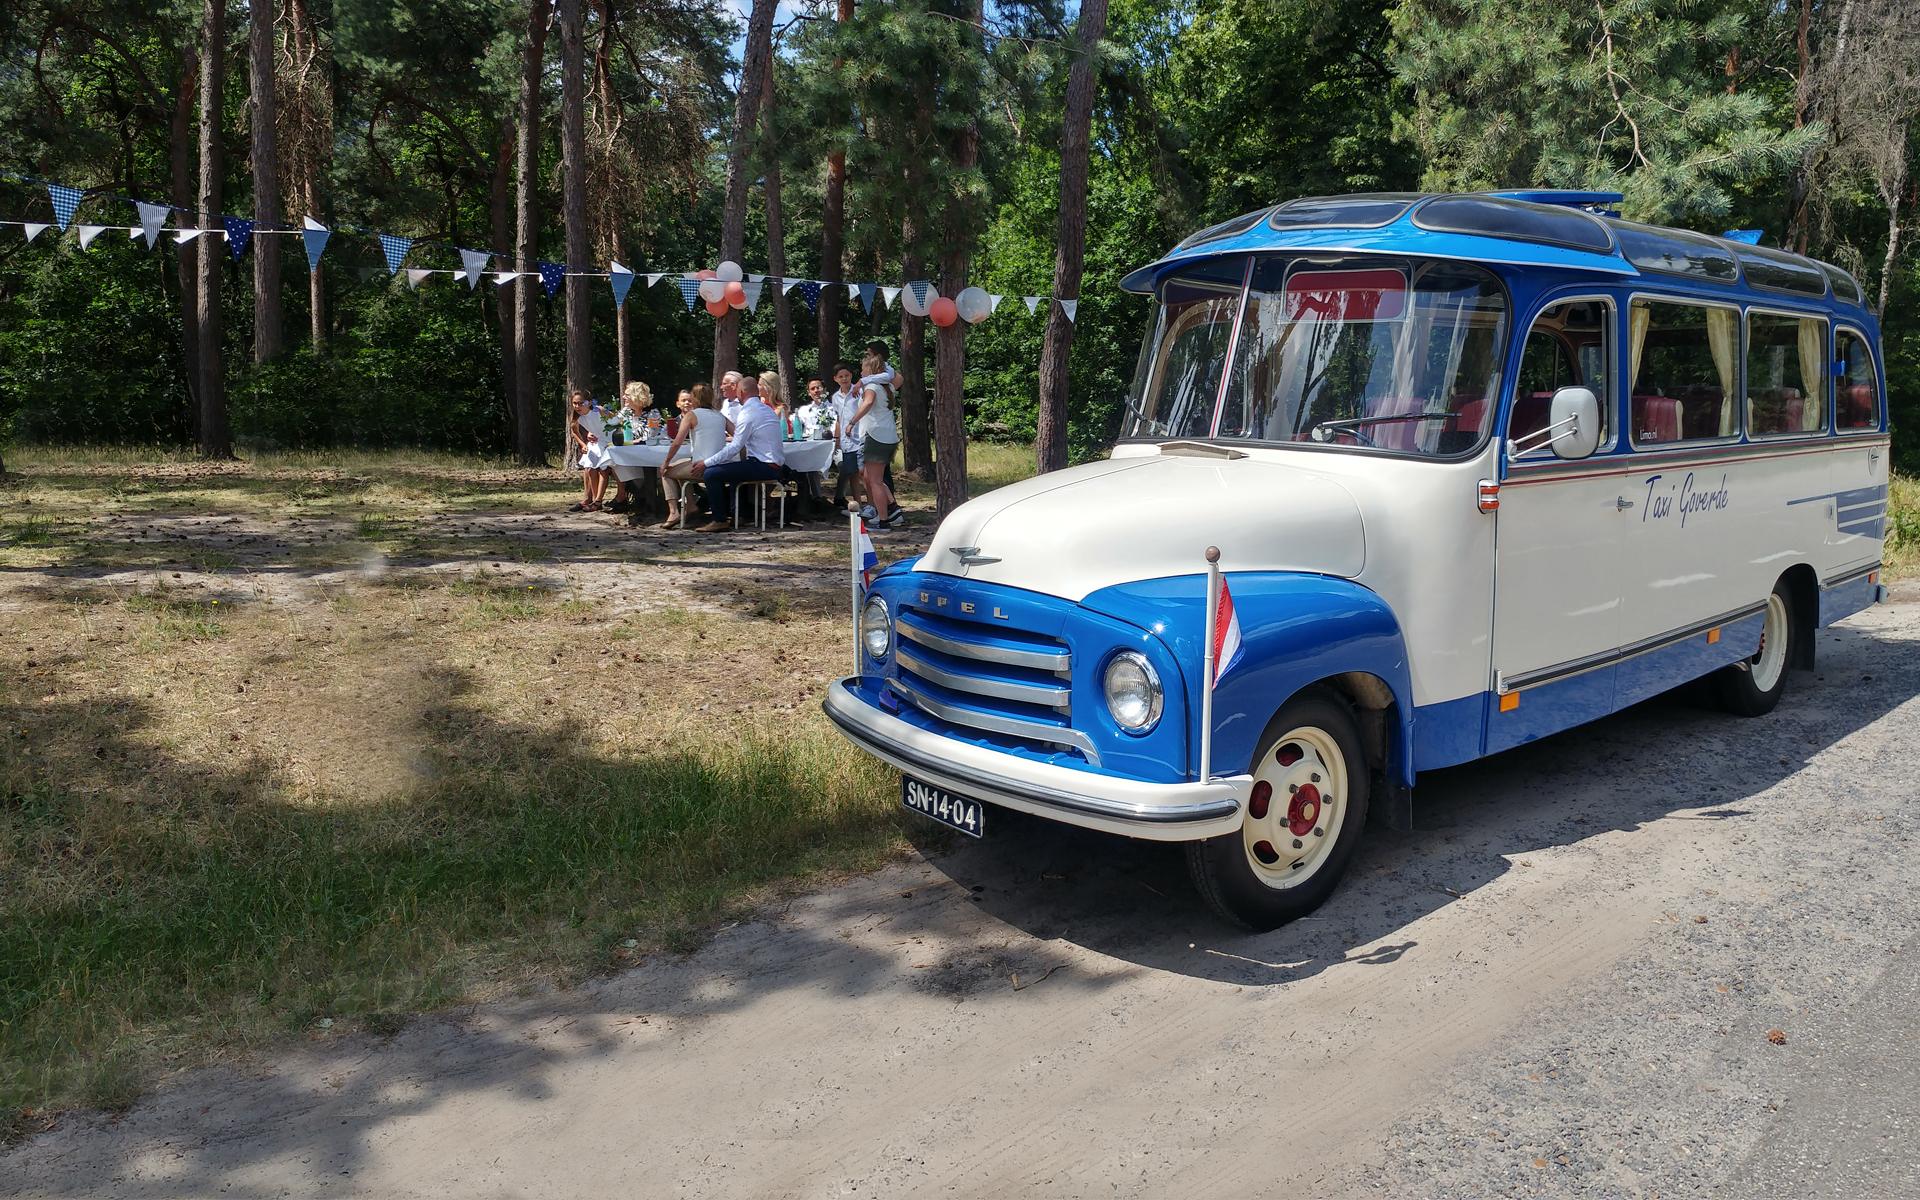 oldtimer bus 14 personen